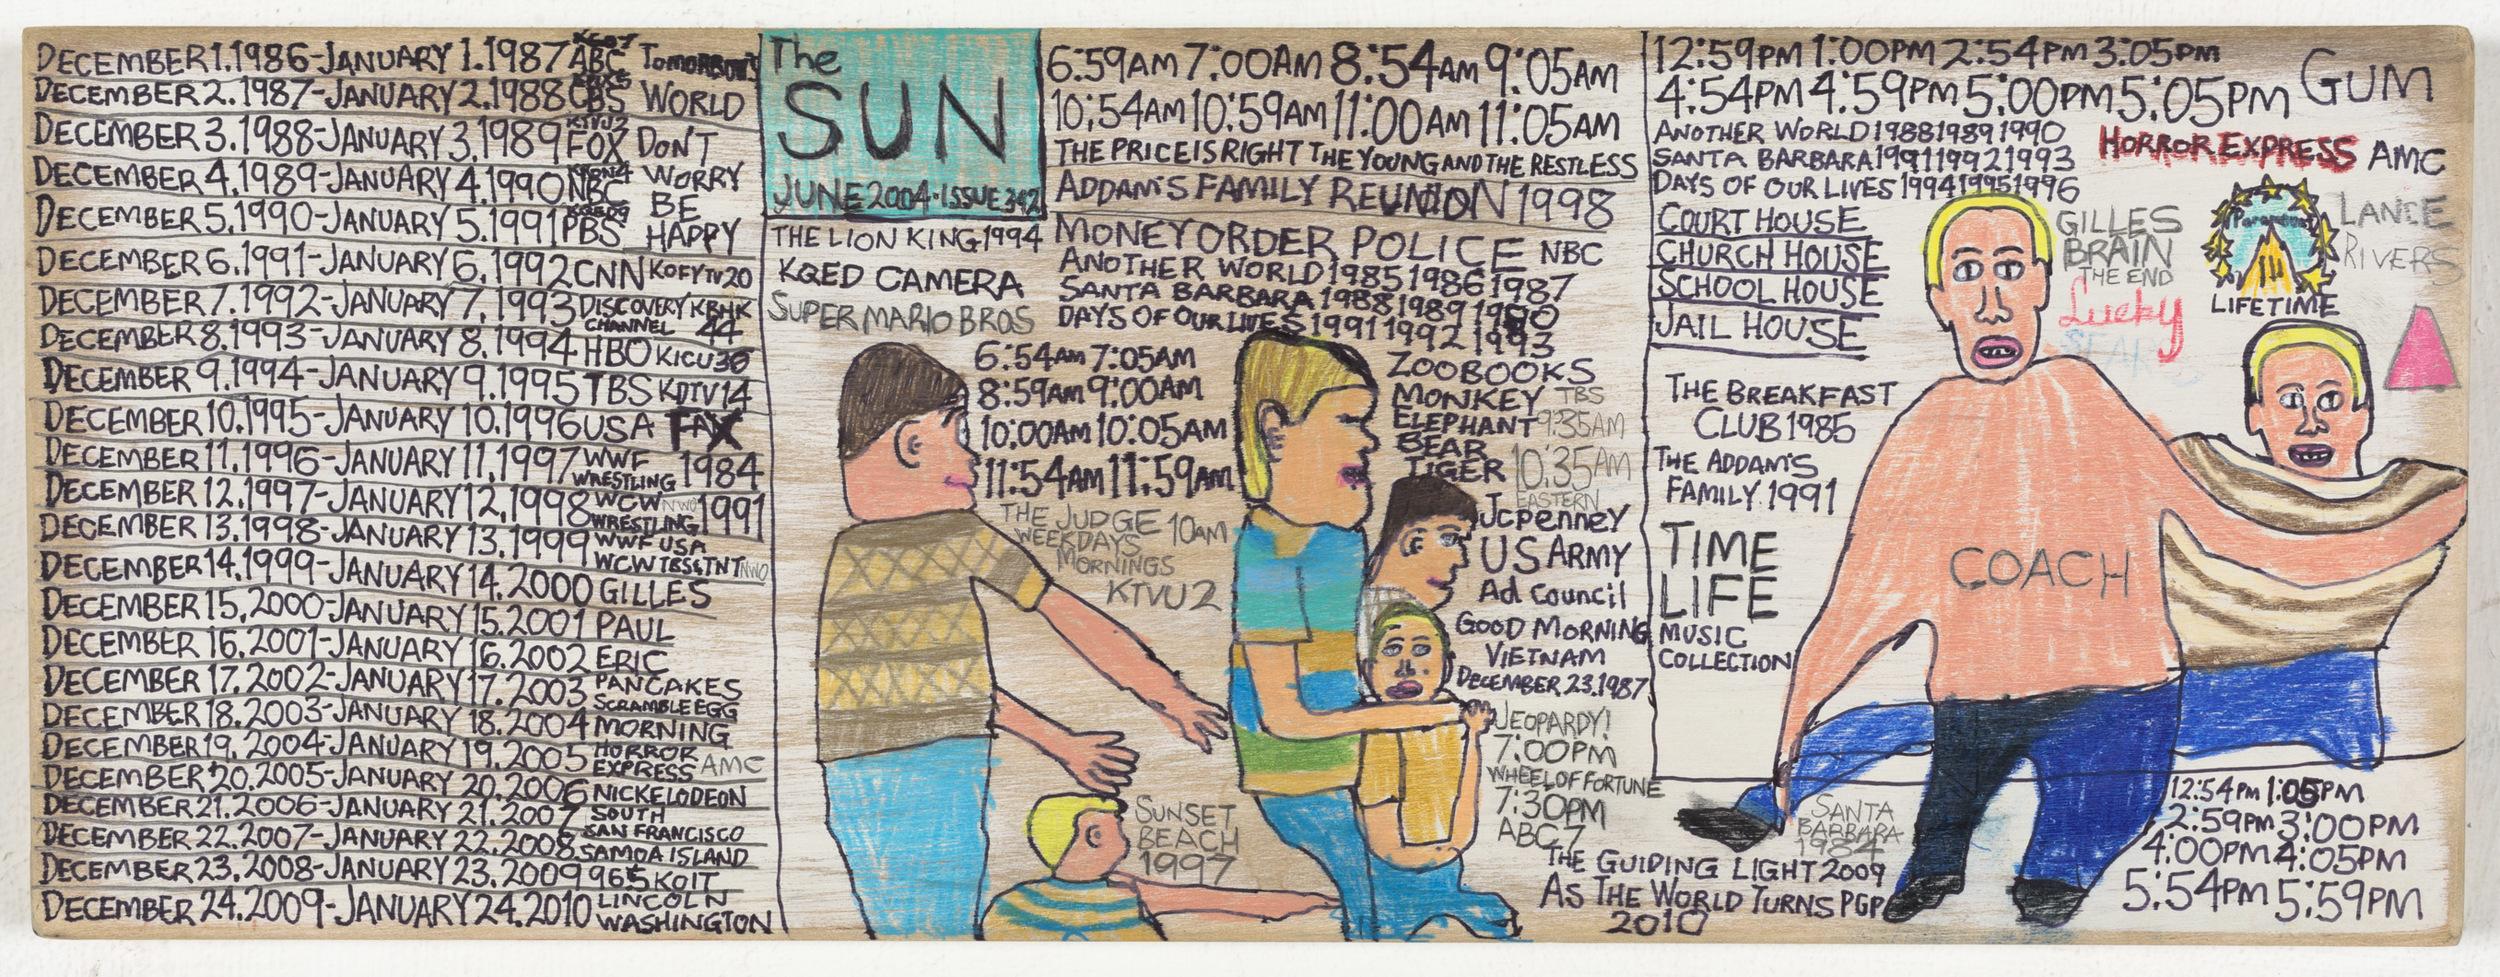 Daniel Green,  The Sun , 2015, mixed media on wood, 6 x 16.5 x 1 inch